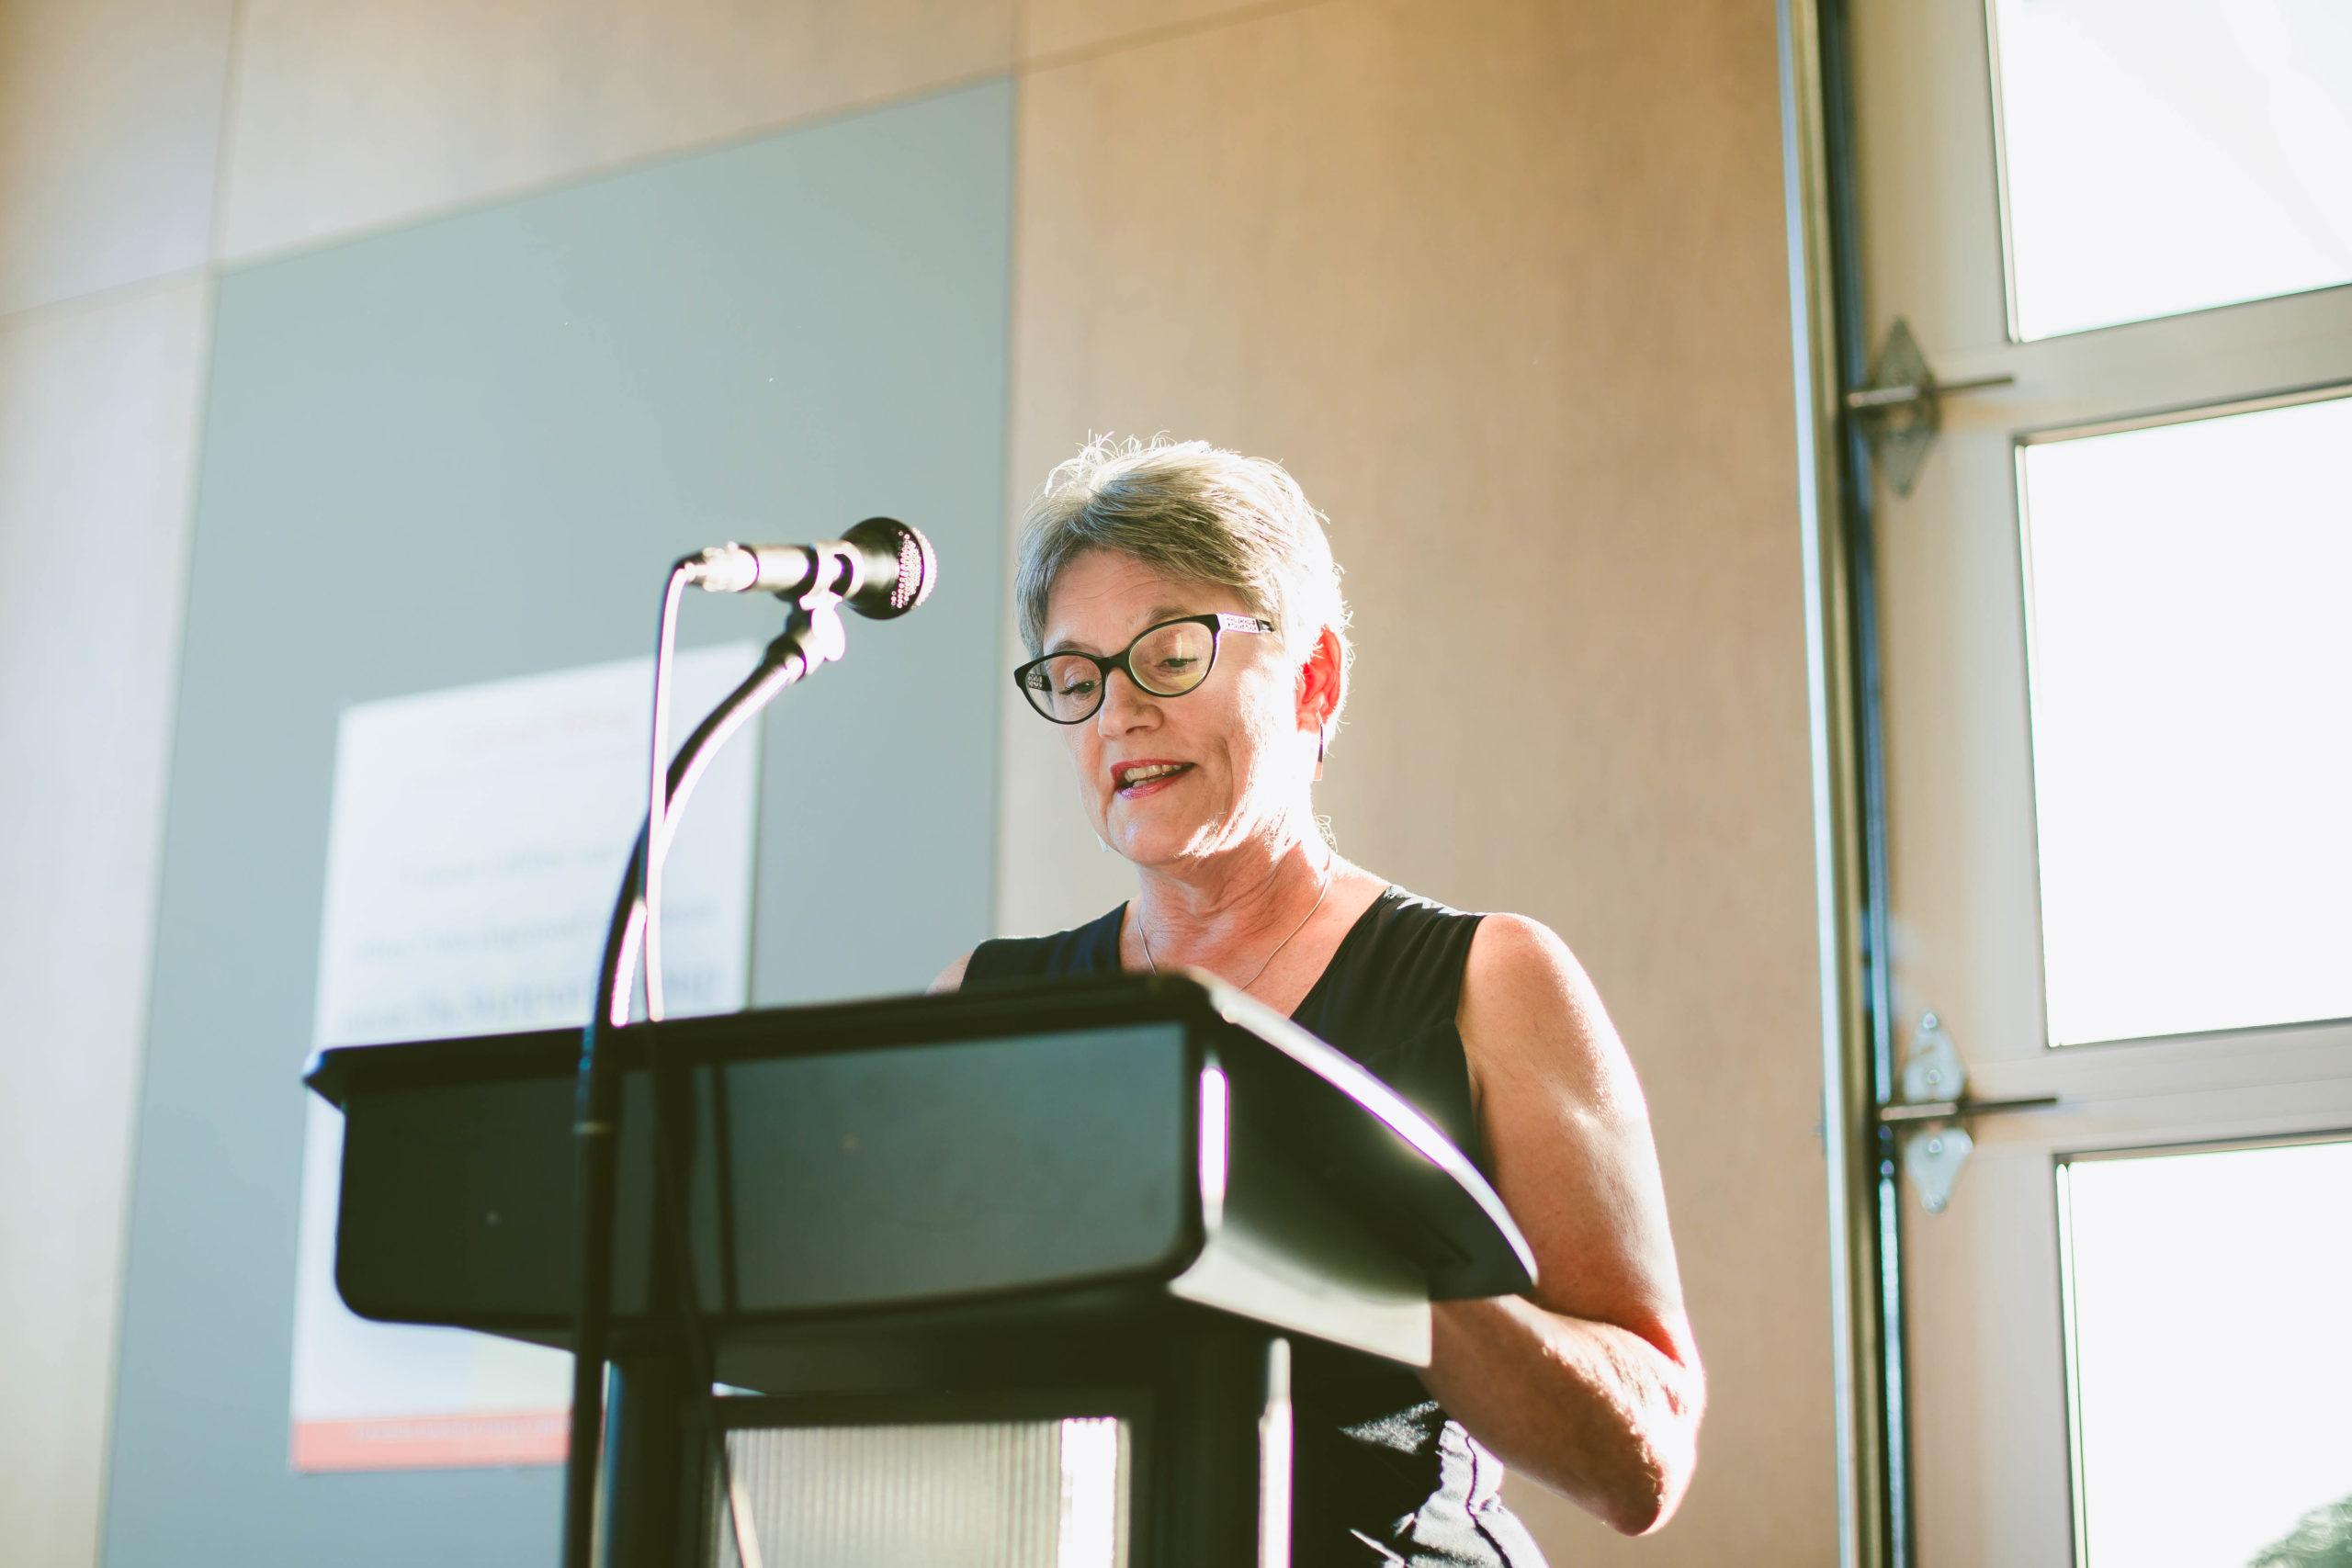 Mary Ellen Shands, Recipient of the 2020 Barbara Frederick Award